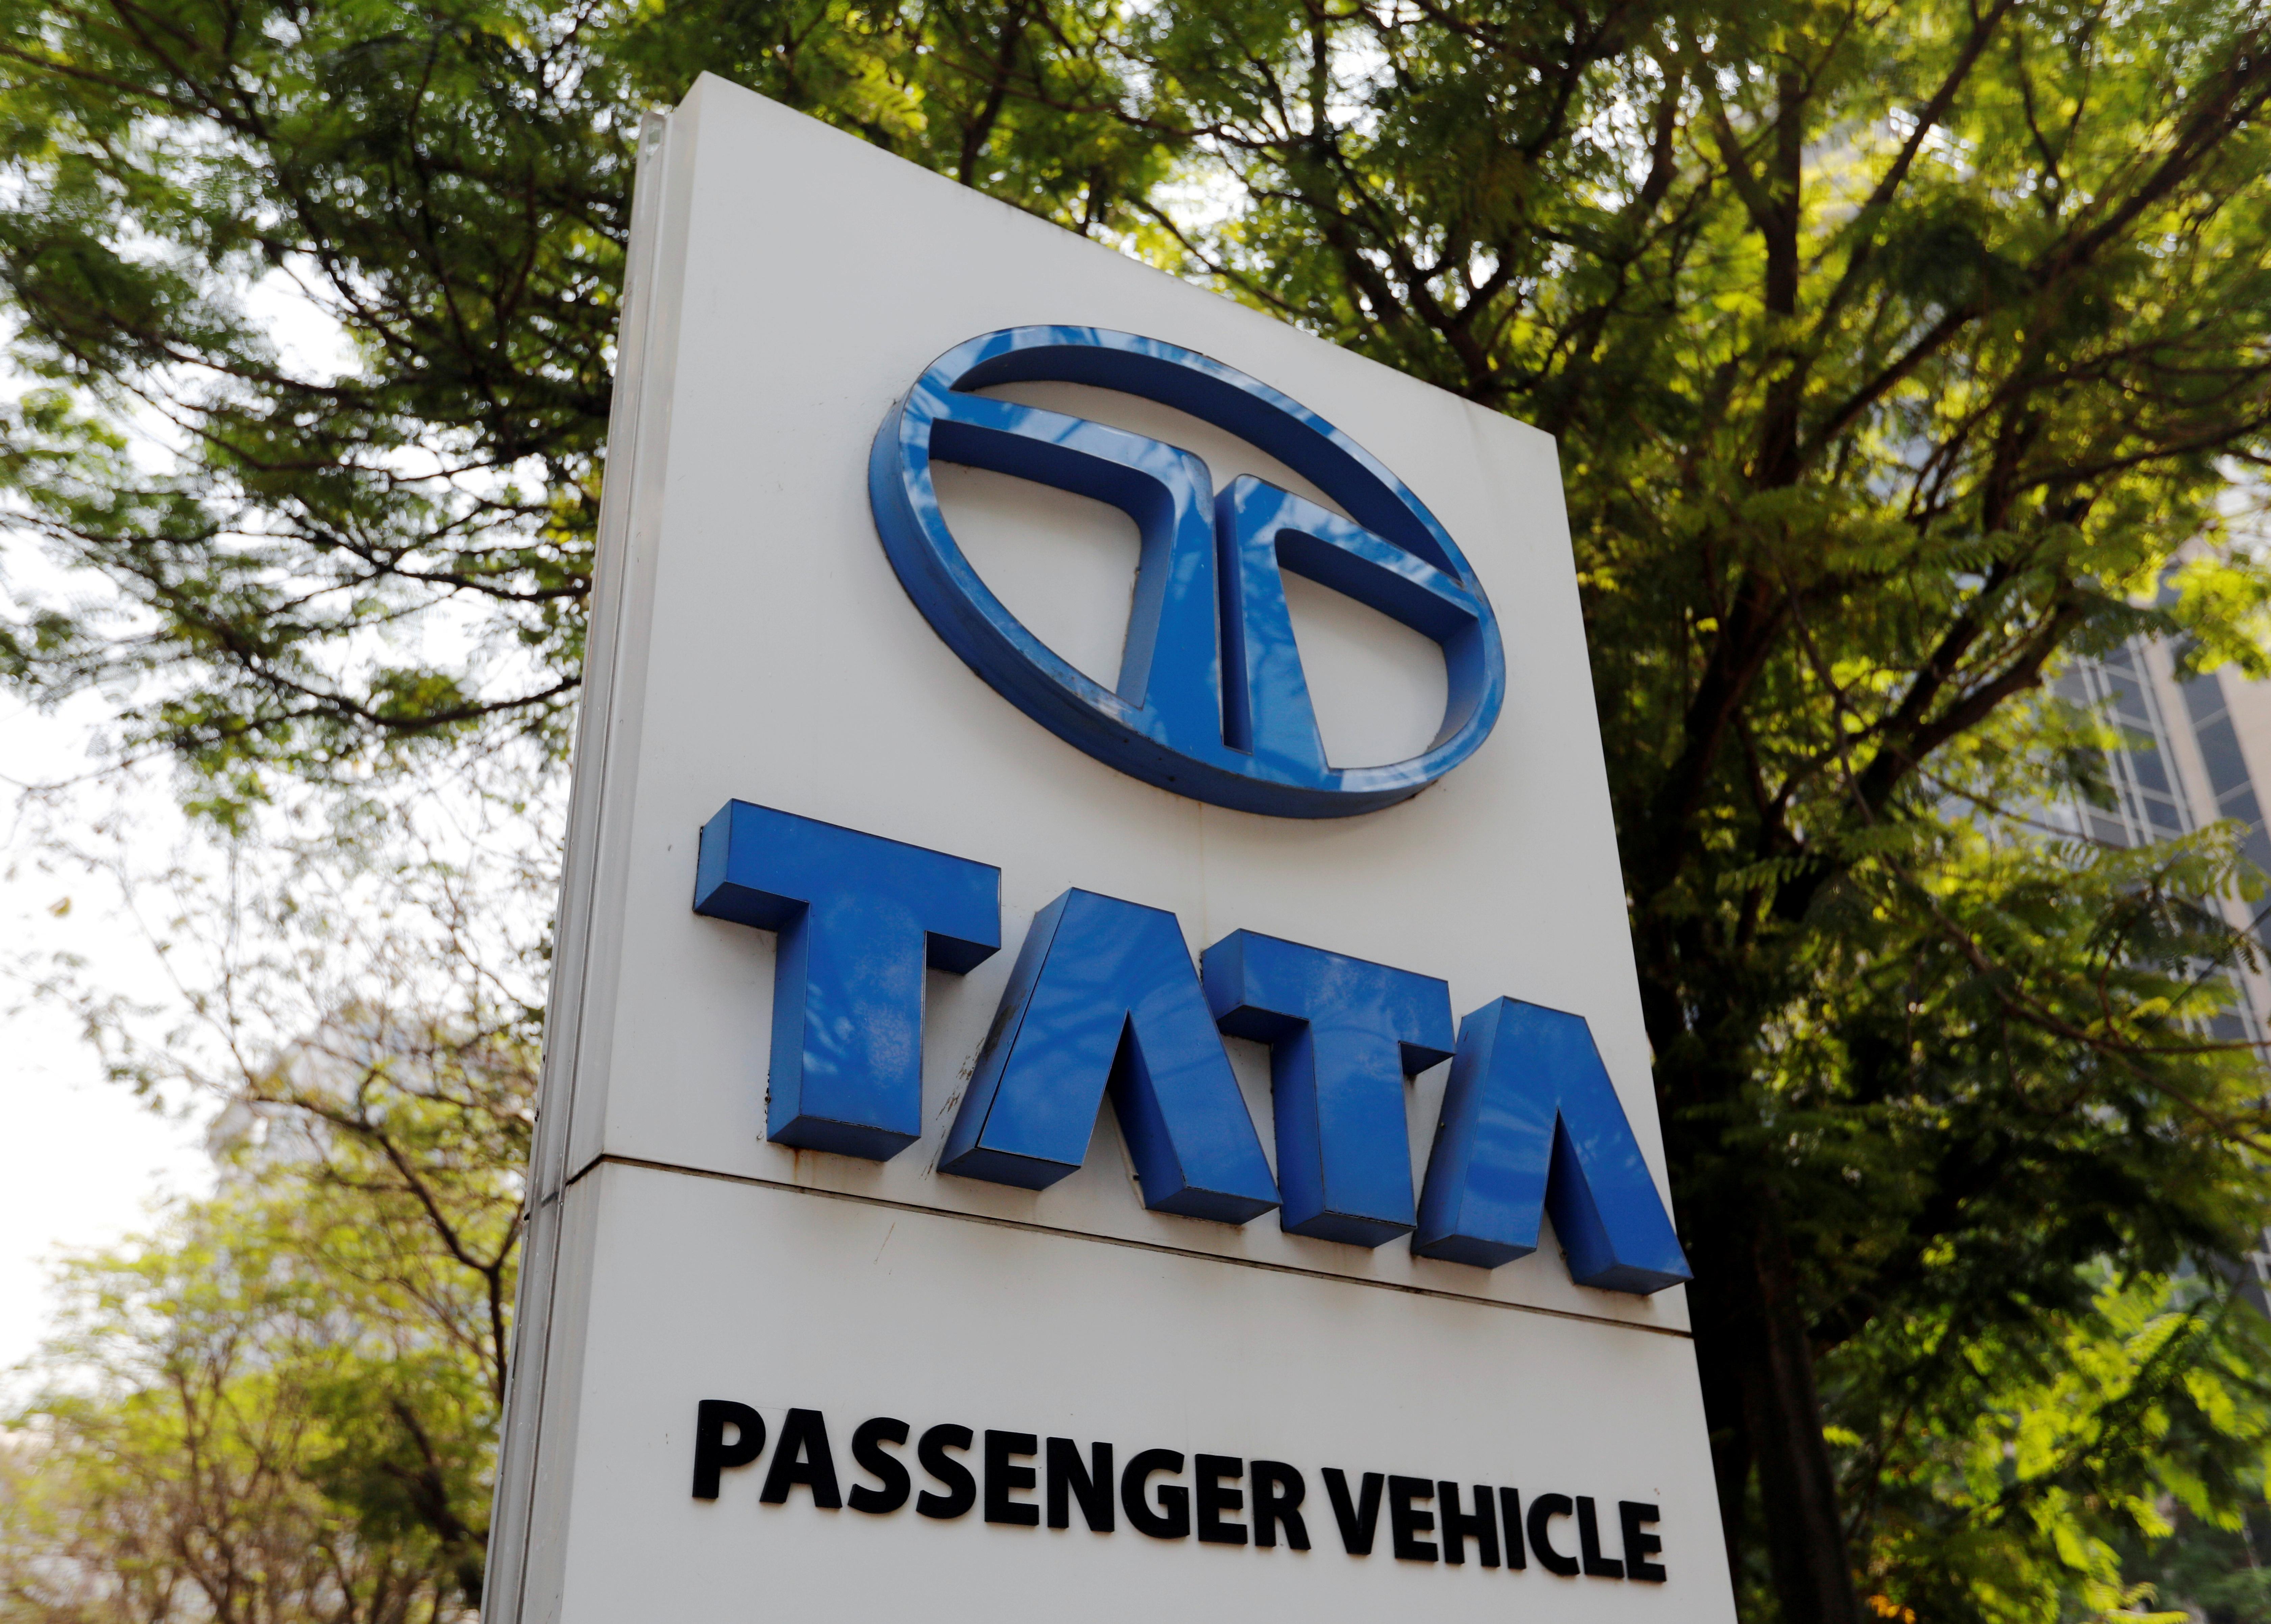 A Tata Motors logo is pictured outside the company showroom in Mumbai, India February 5, 2018. REUTERS/Danish Siddiqui/File Photo